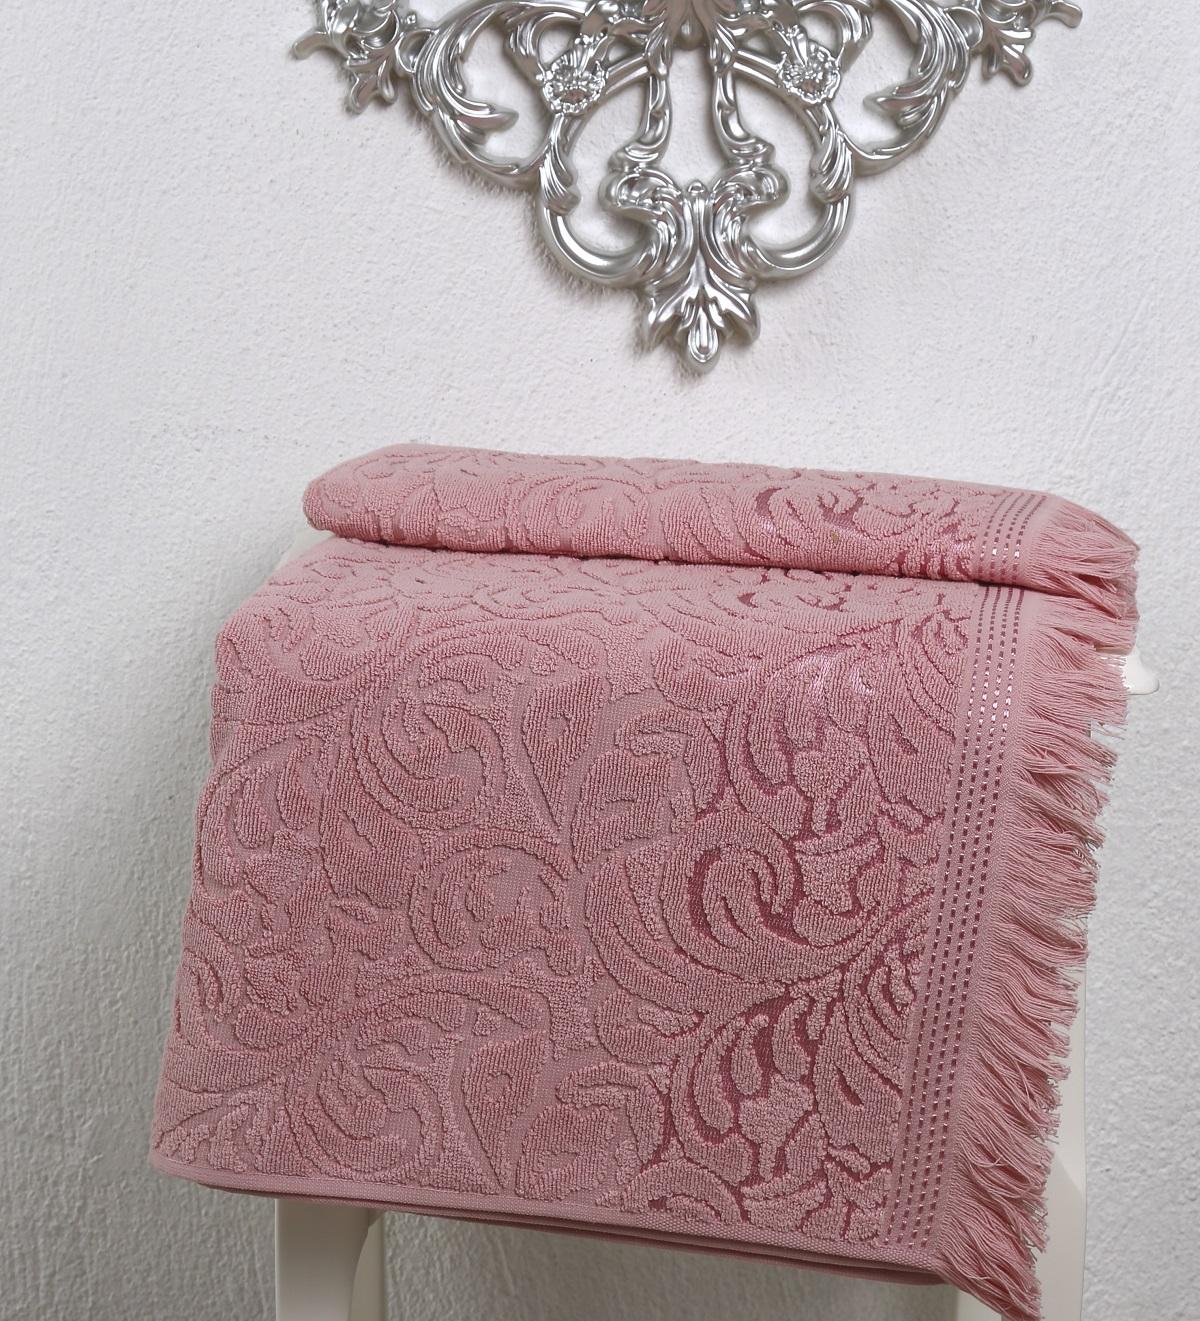 Купить Полотенца Karna, Полотенце Esra Цвет: Розовый (90х150 см), Турция, Махра